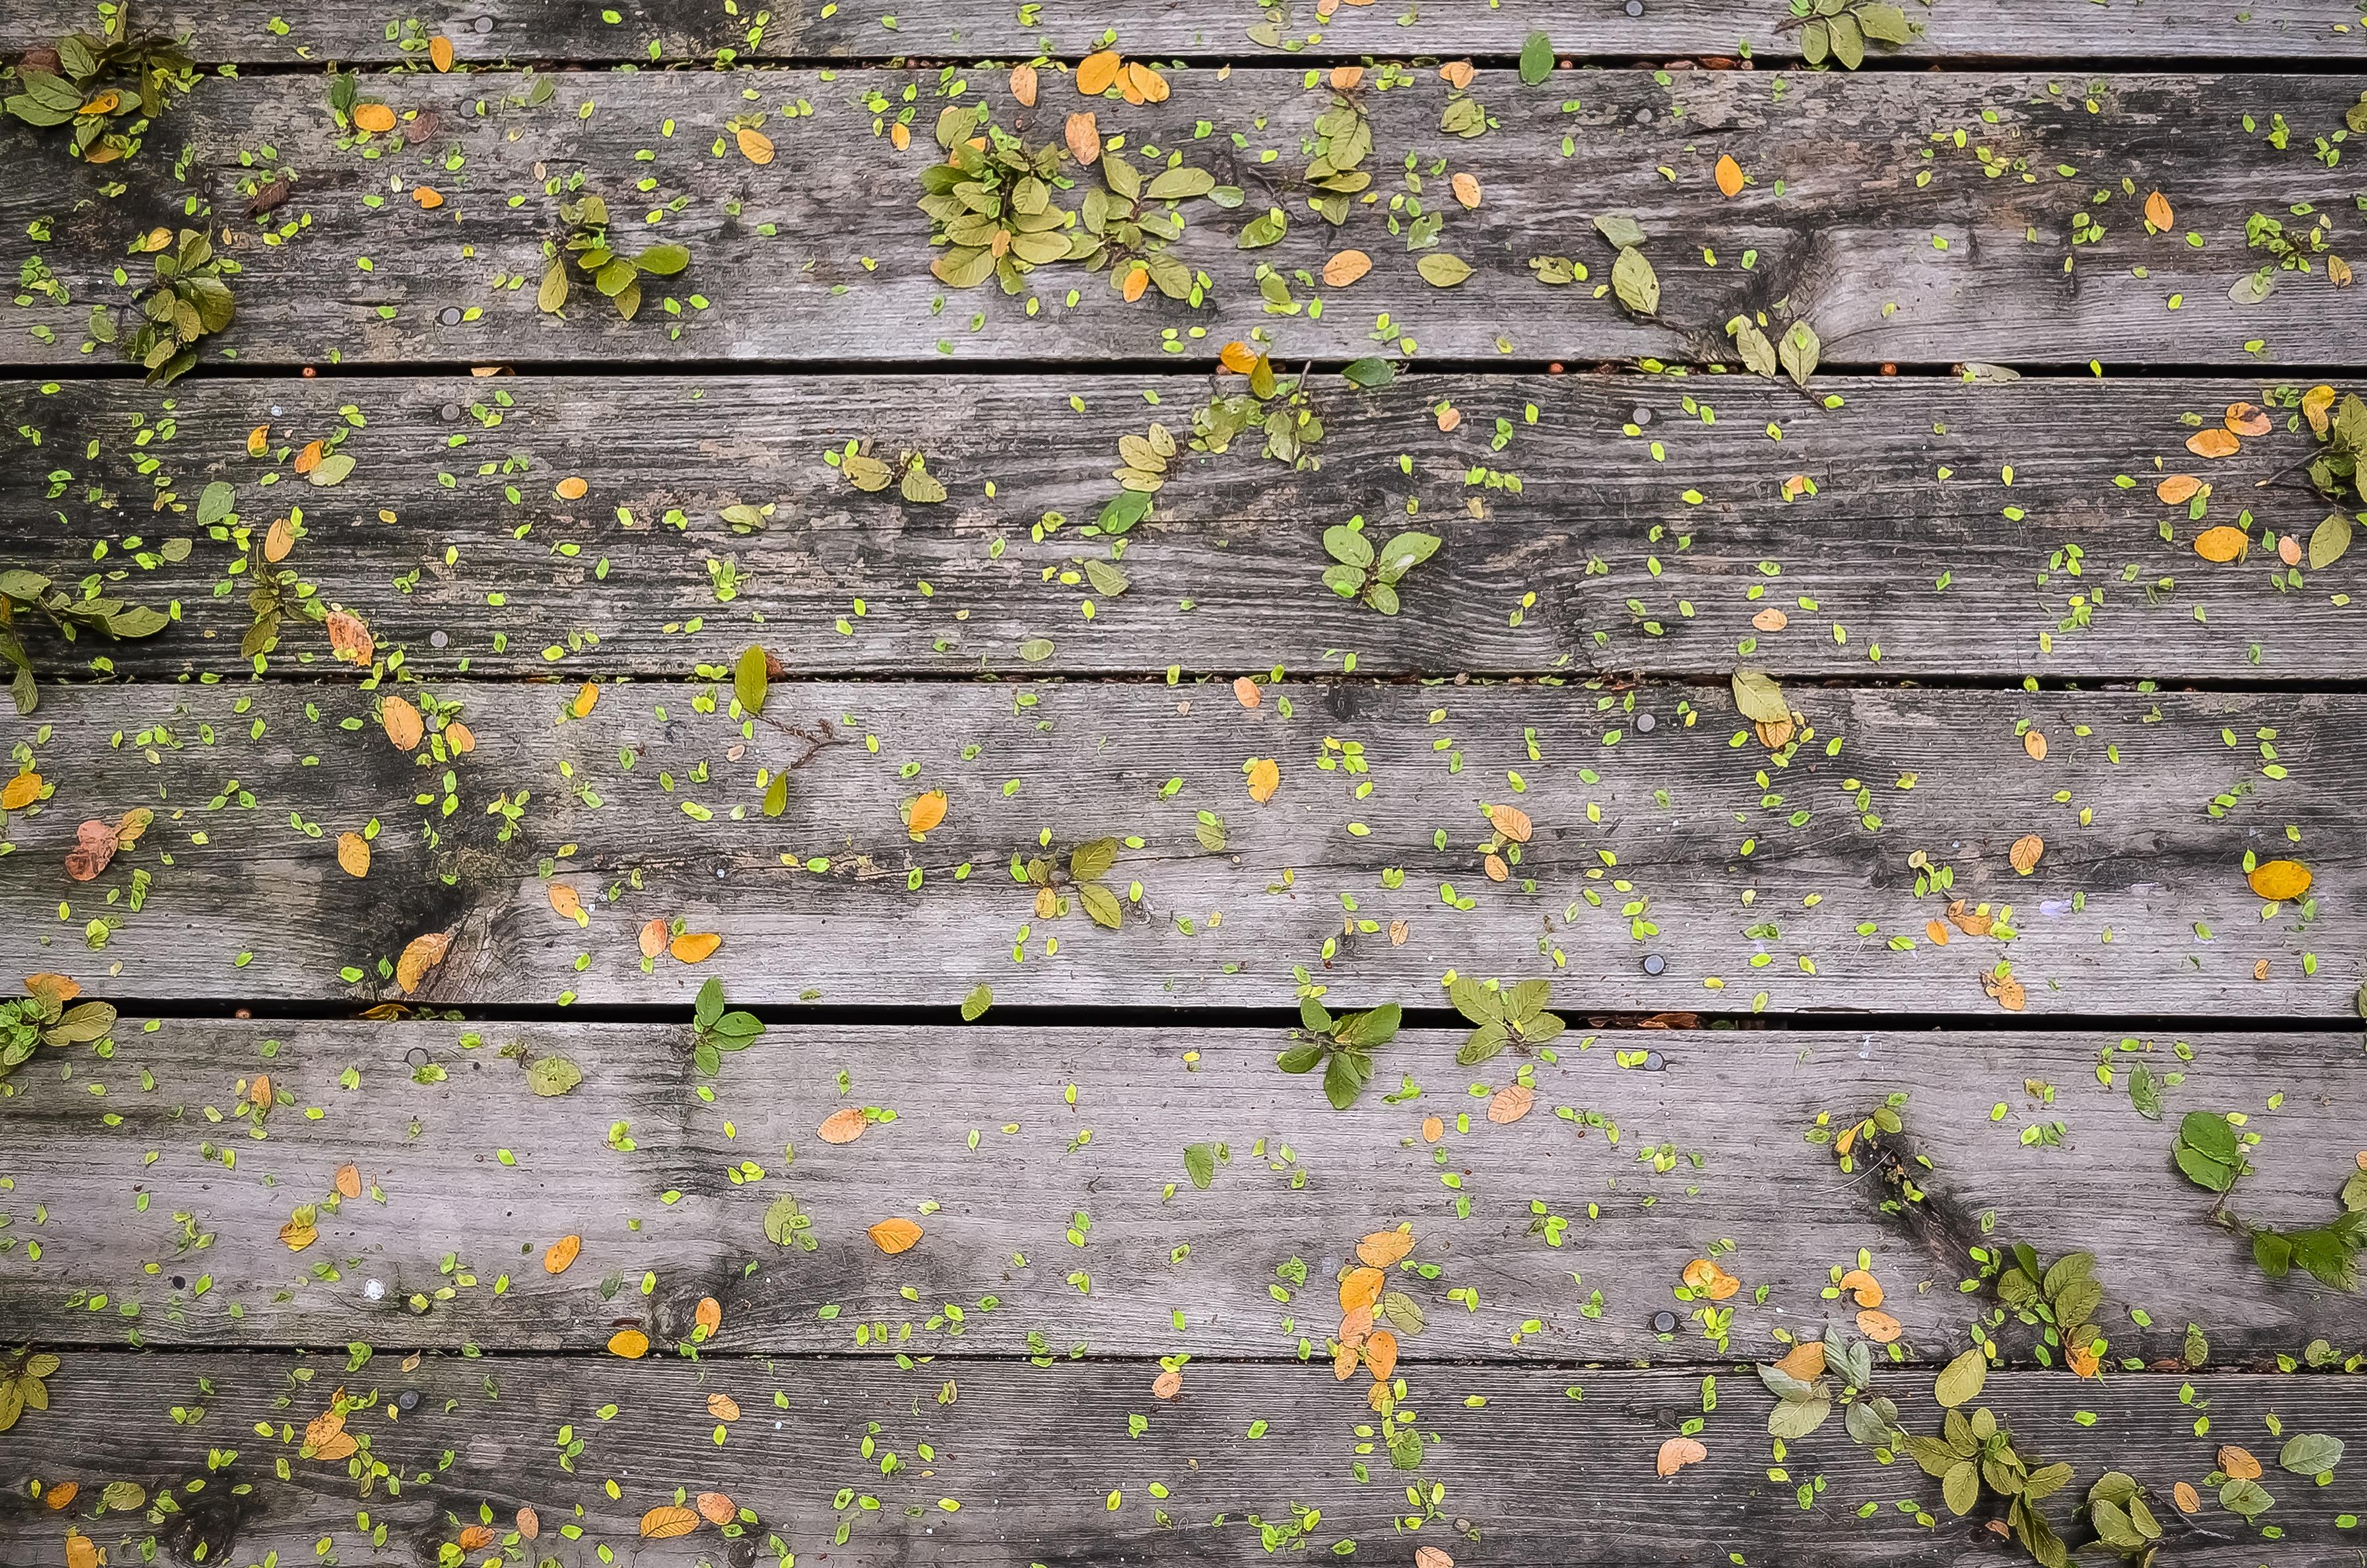 Fotos gratis rbol planta textura hoja flor pared for Leroy merlin tappezzeria